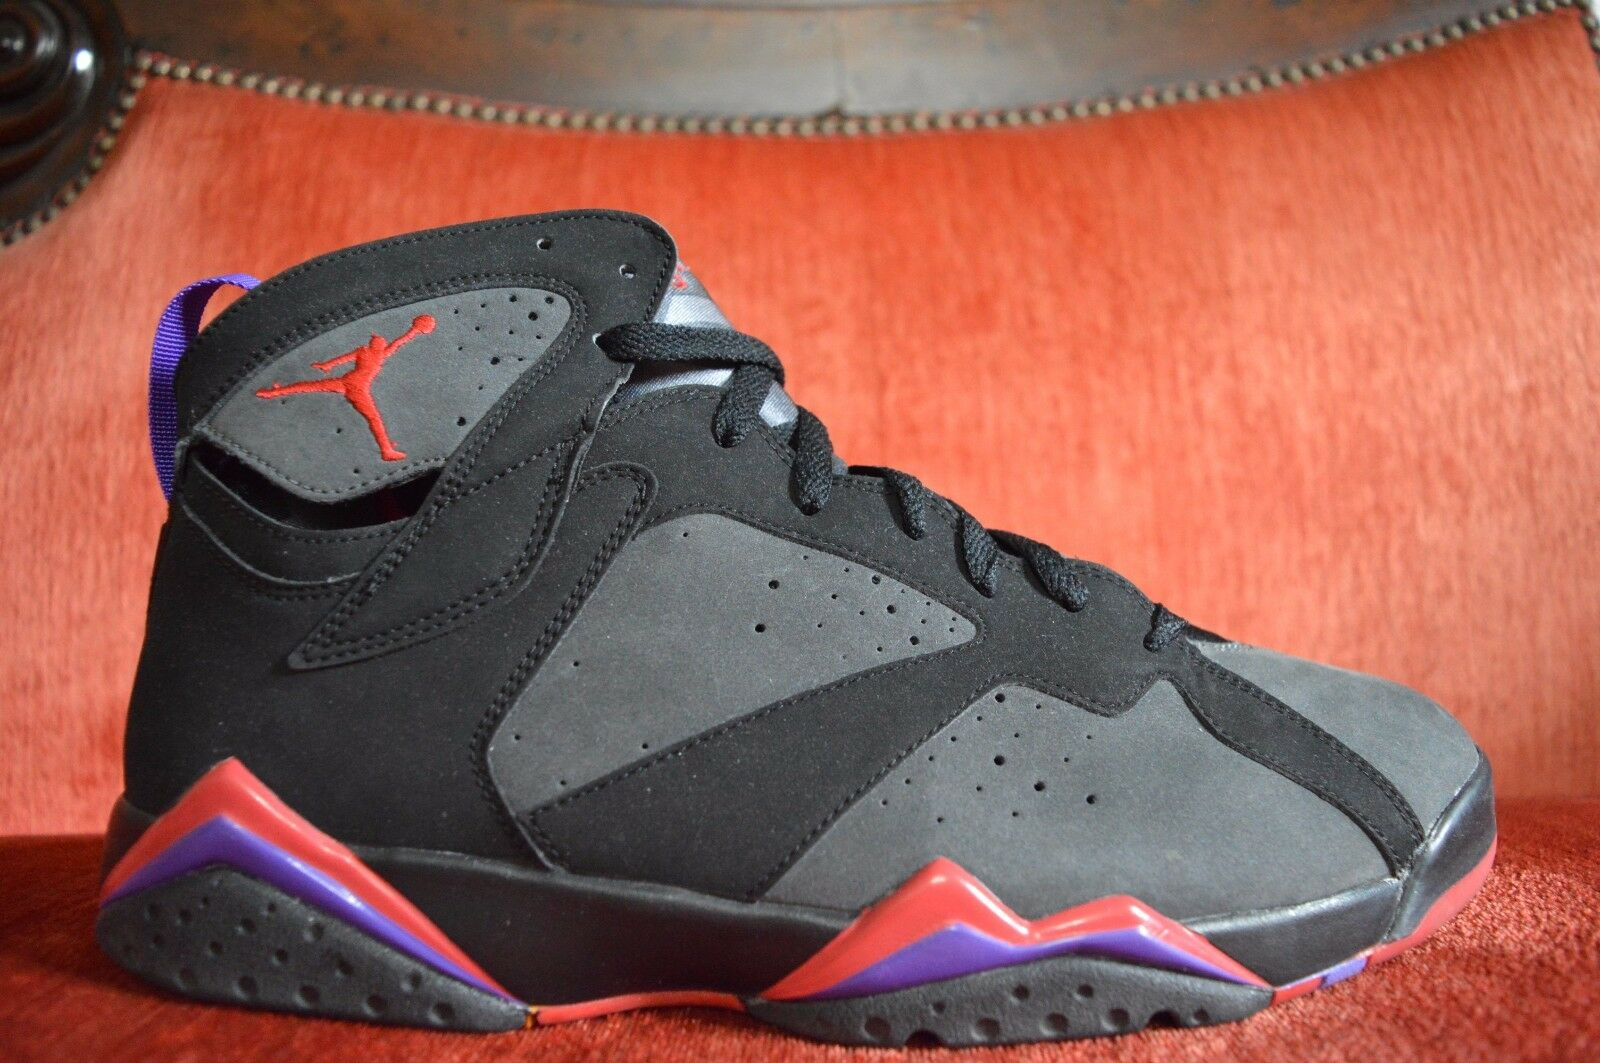 los angeles d3b51 a8fdb WORN WORN WORN 2X Nike Air Jordan VII 7 Retro TORONTO RAPTORS DMP PACK  304775-